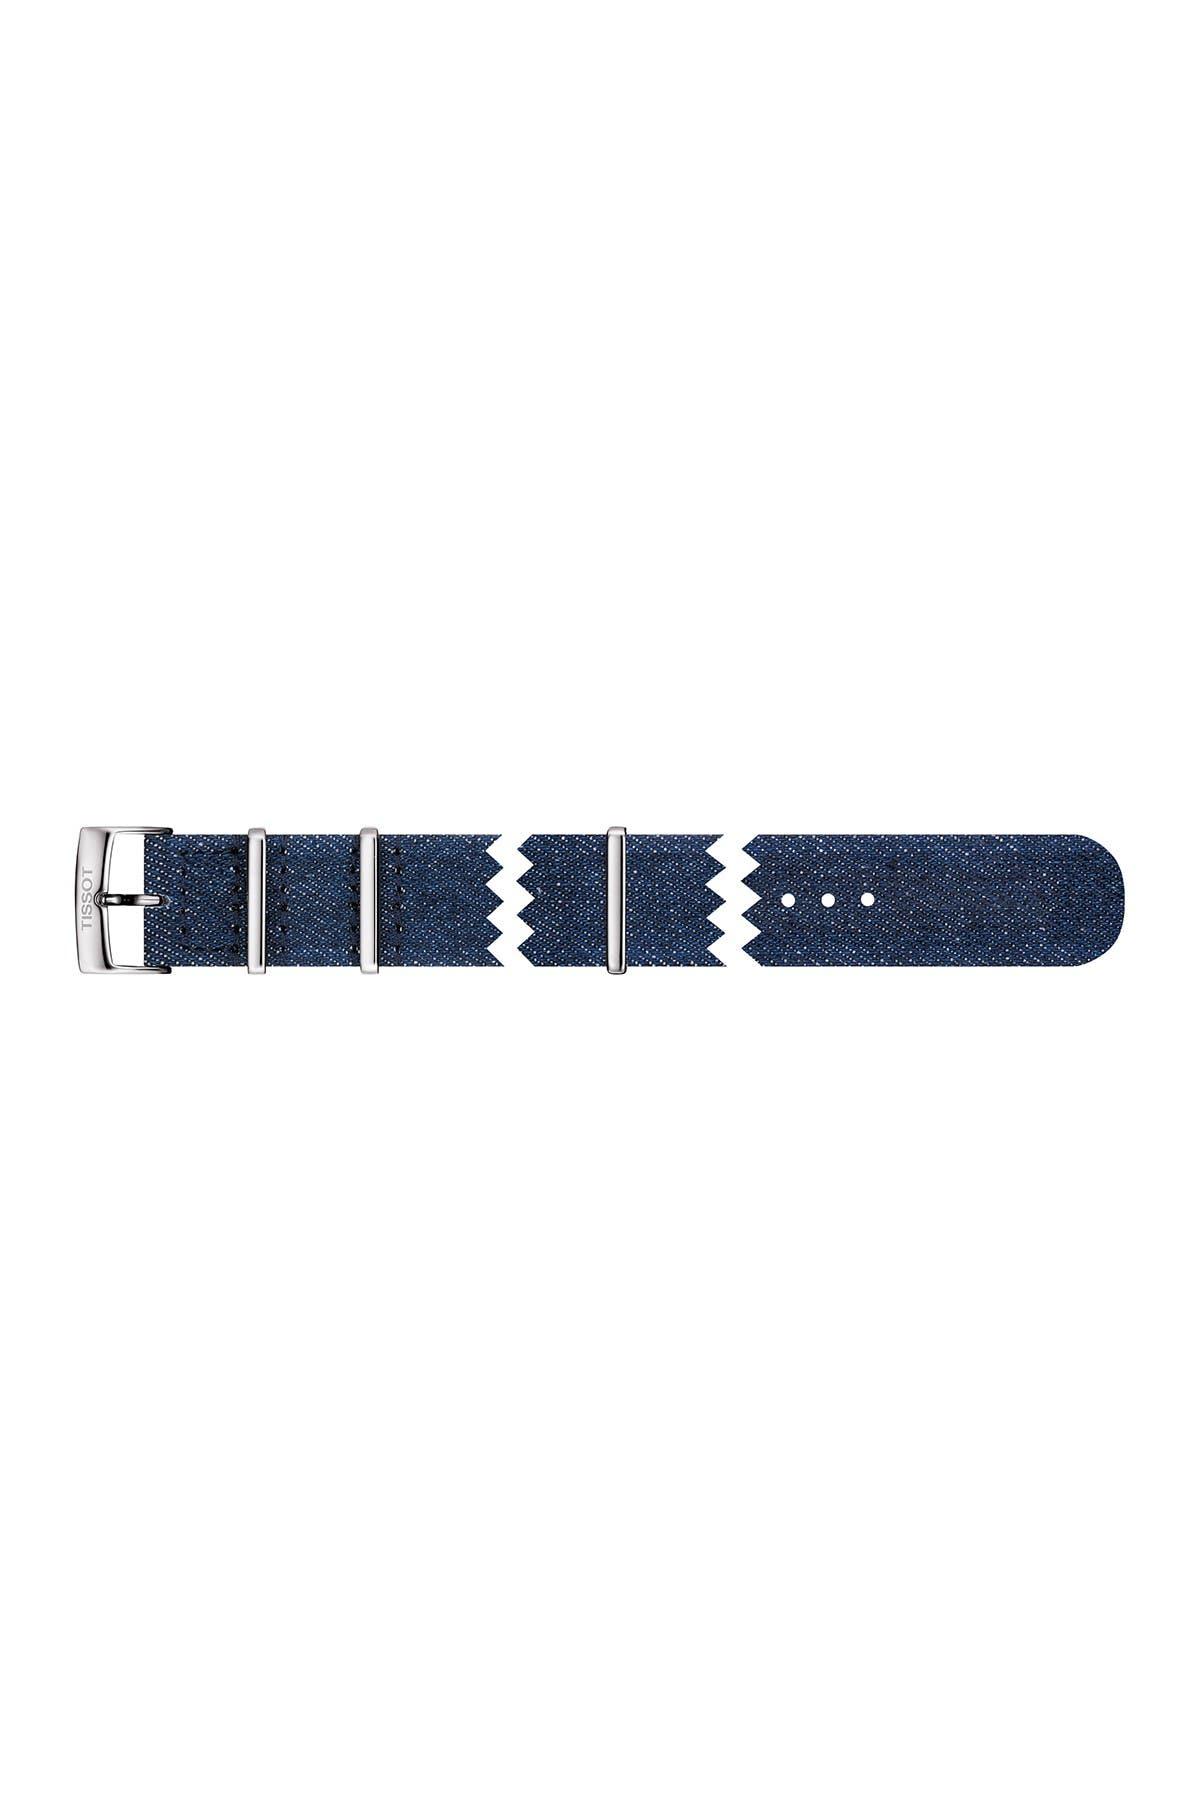 Image of Tissot Men's PRS516 Powermatic Textile Strap Watch, 42mm